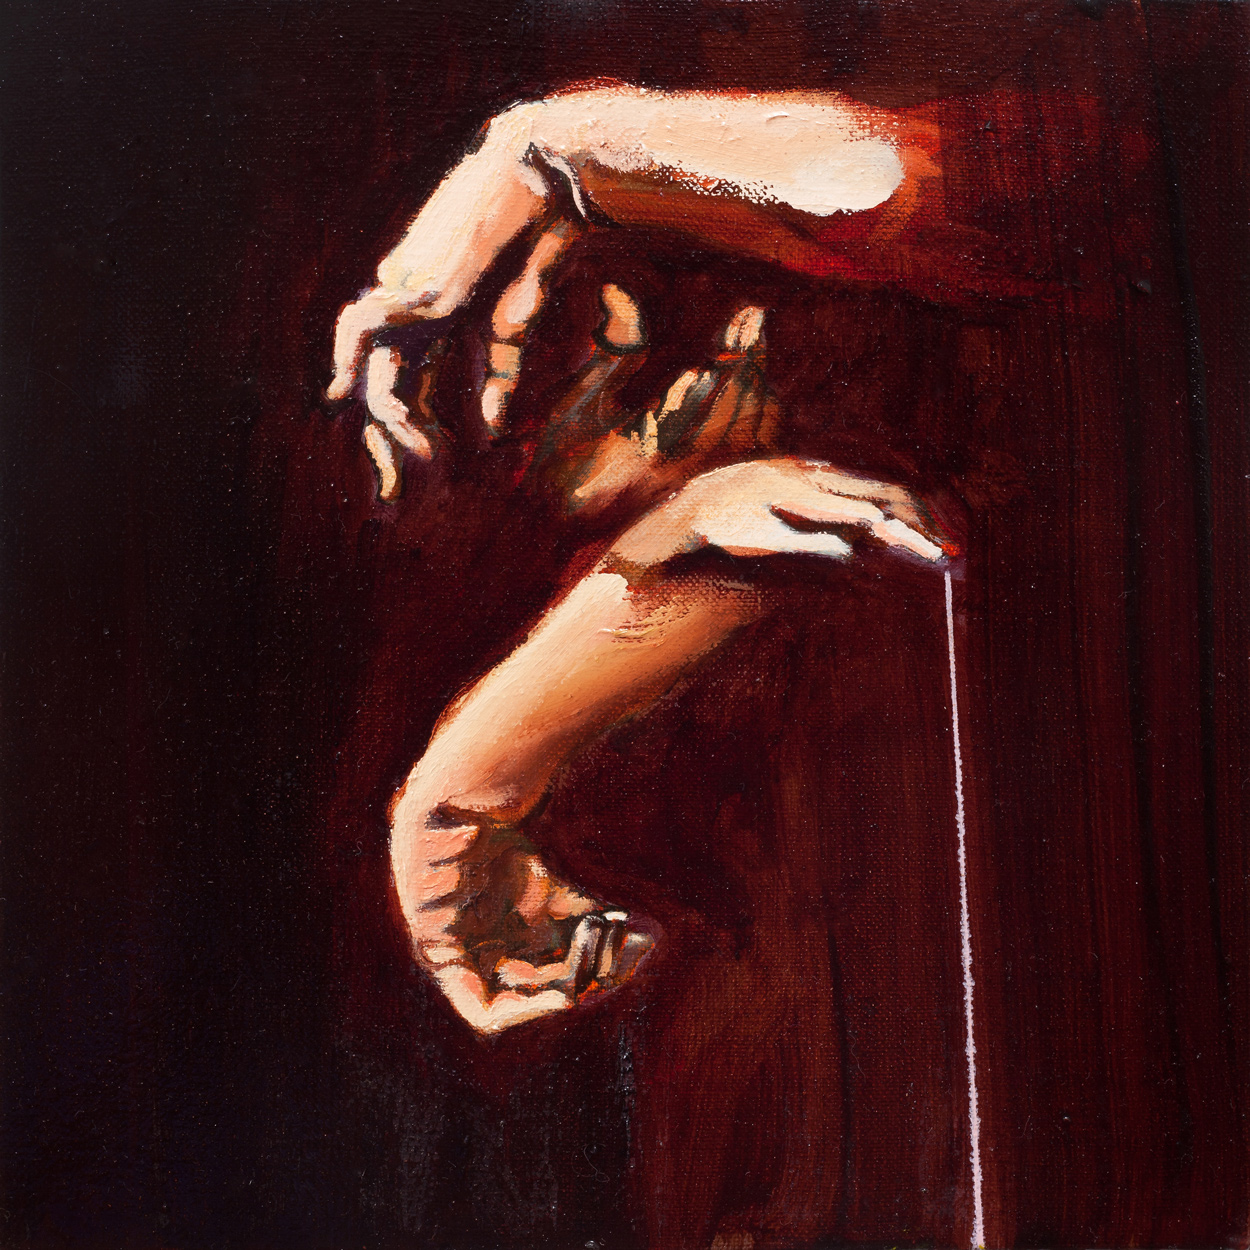 Samson (rubens,hands), Oil on canvas, 40x40 cm, 2013